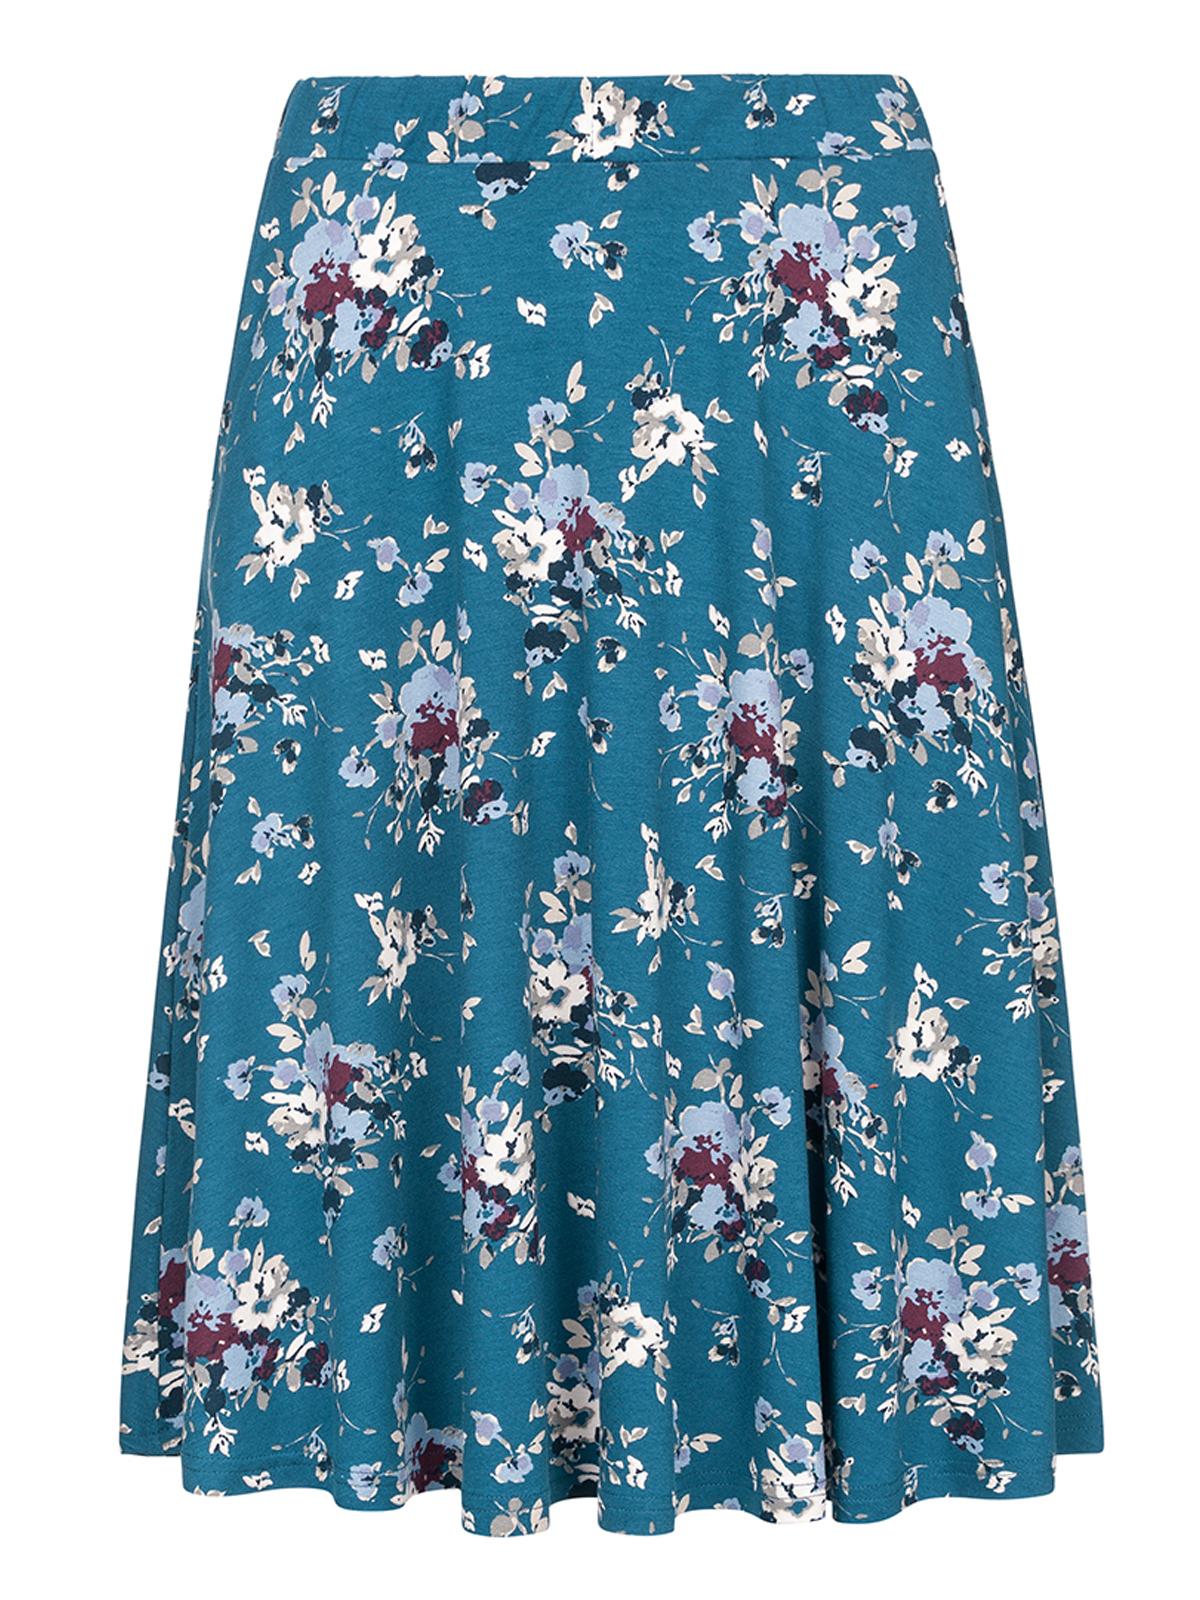 Roecke - Vive Maria Mon Amour Skirt blue allover – Größe S  - Onlineshop NAPO Shop